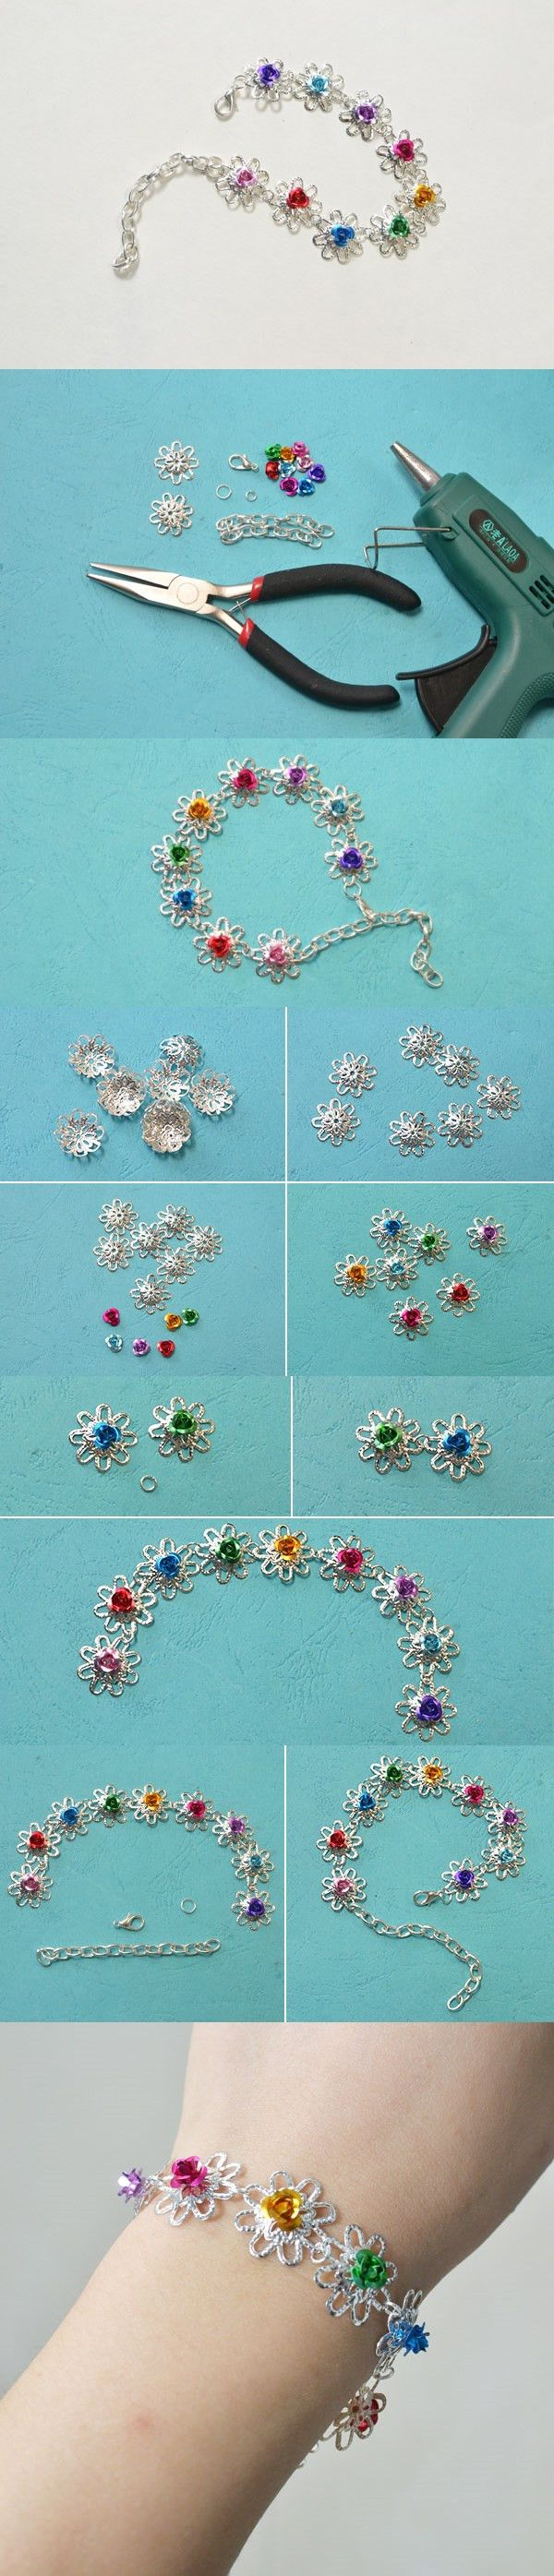 Making Simple Flower Beaded Bracelet with Bead Caps